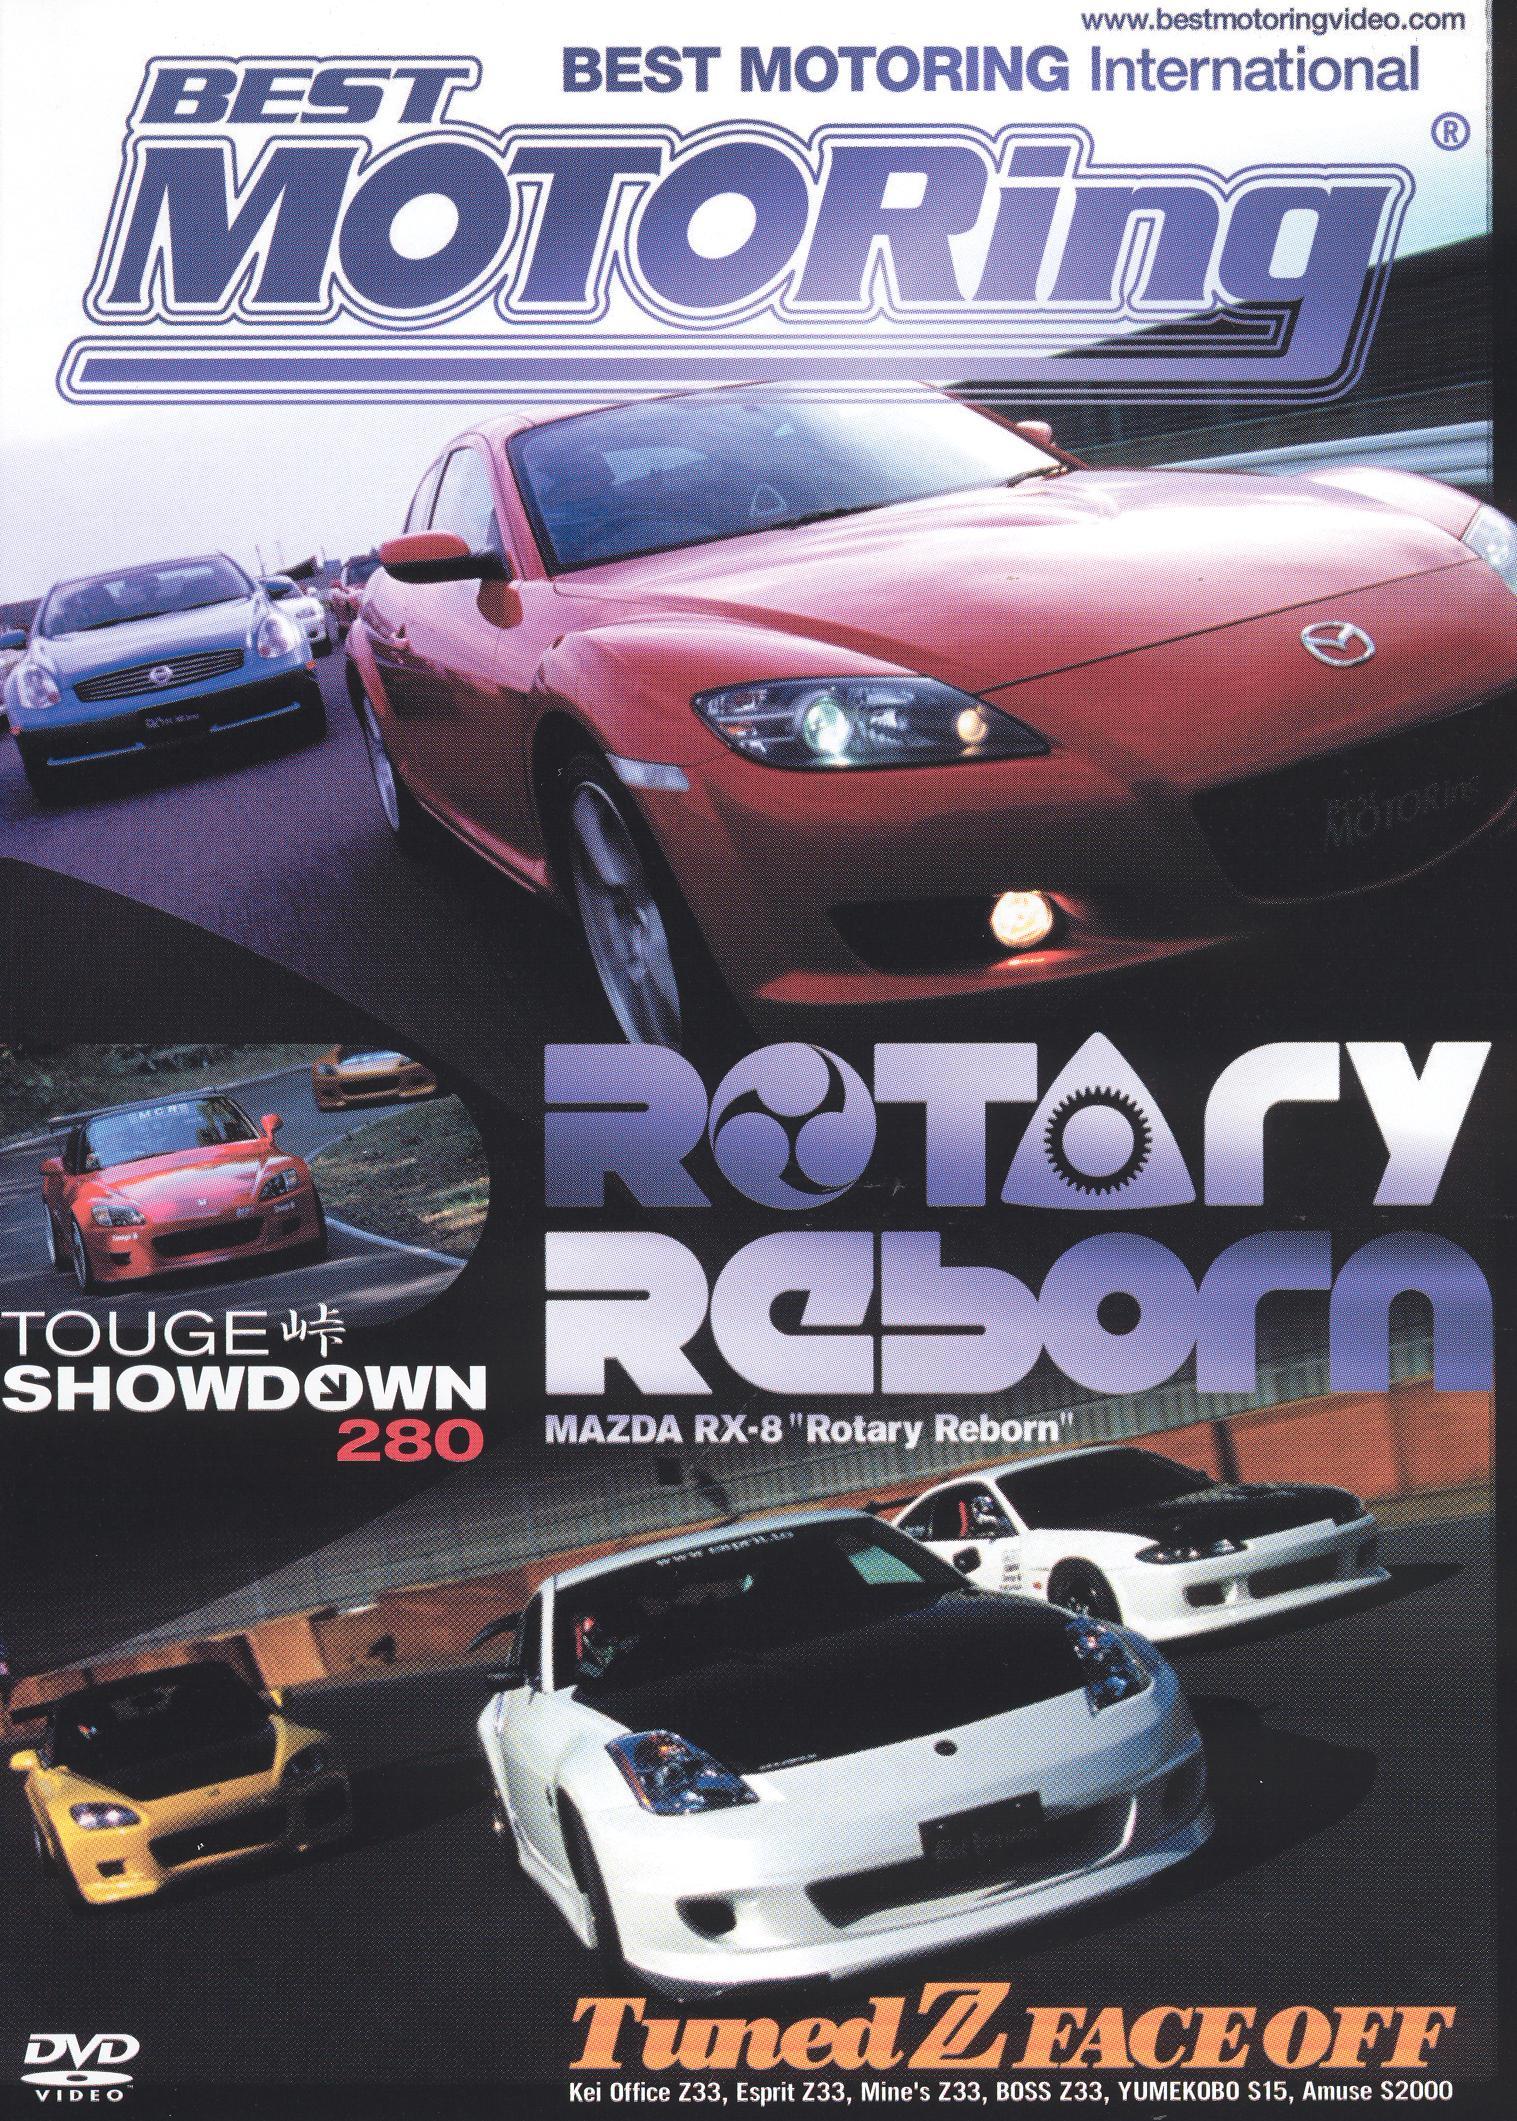 Best Motoring: Rotary Reborn